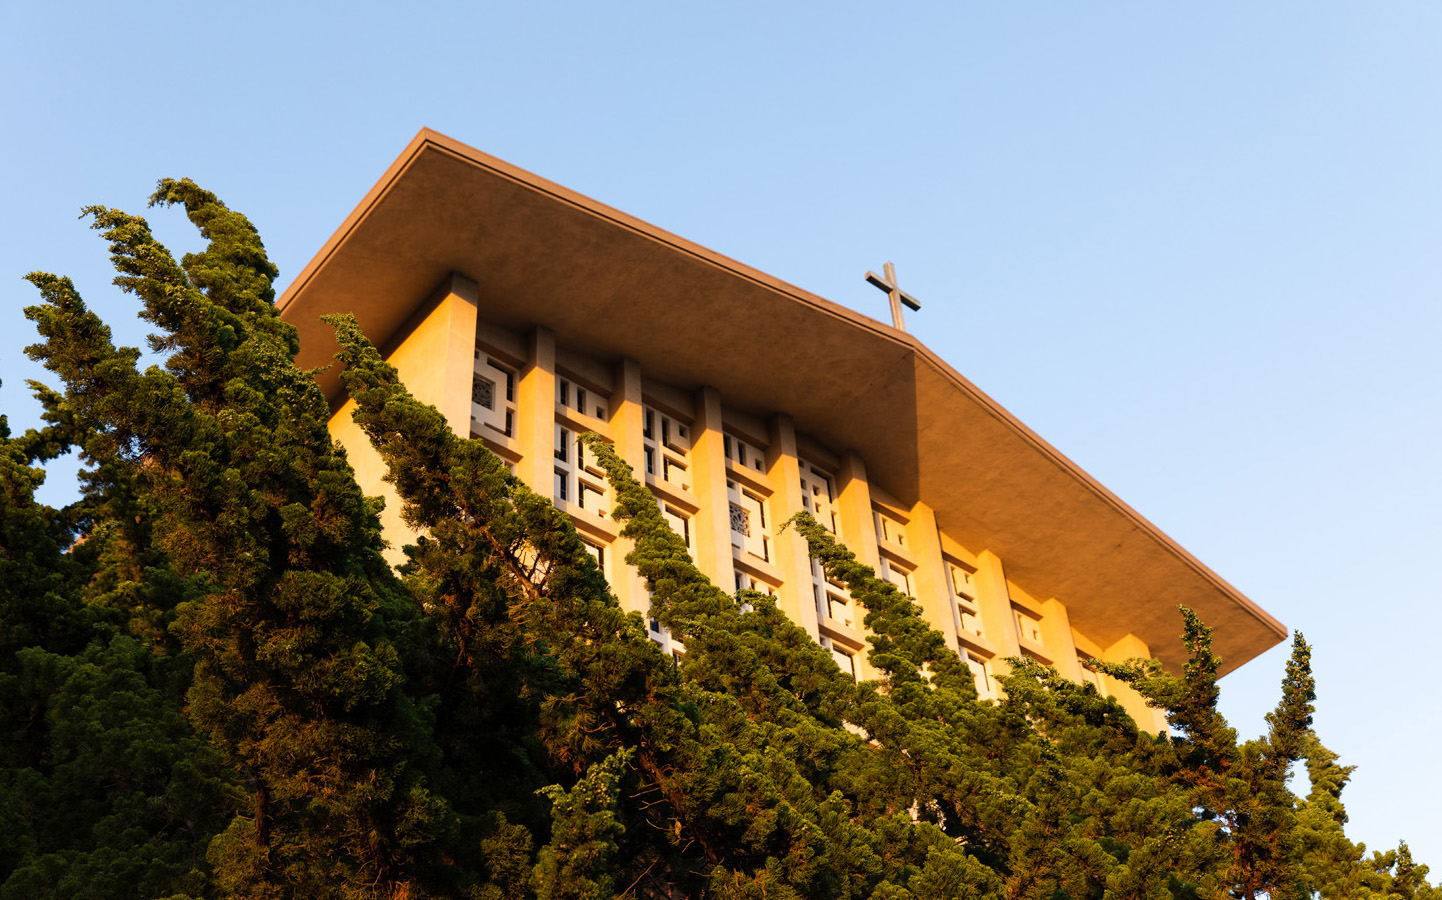 Holy Names University campus chapel